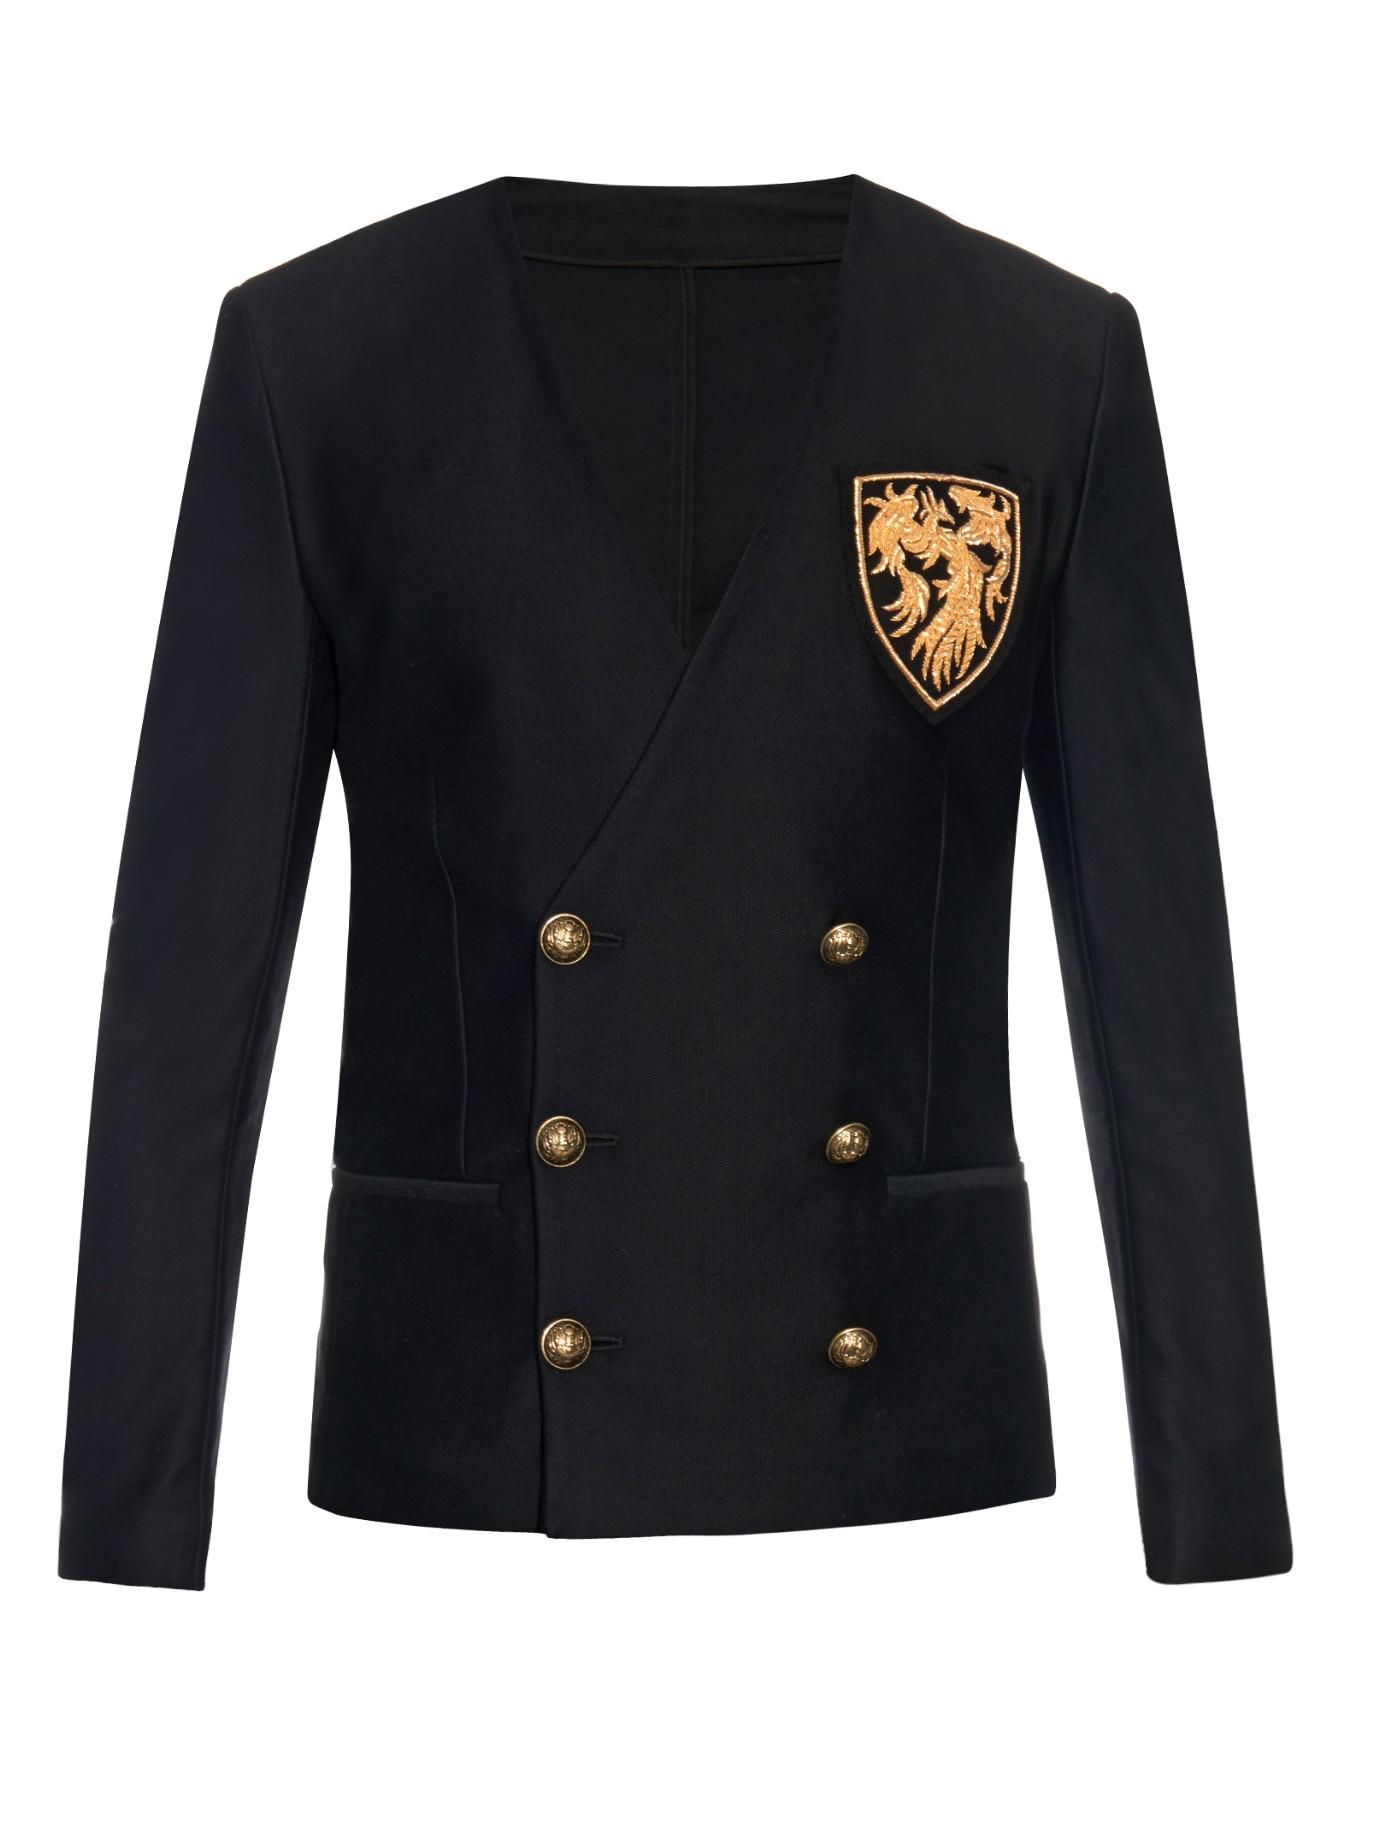 Balmain Sizing | White Blazer Gold Buttons | Balmain Double Breasted Blazer